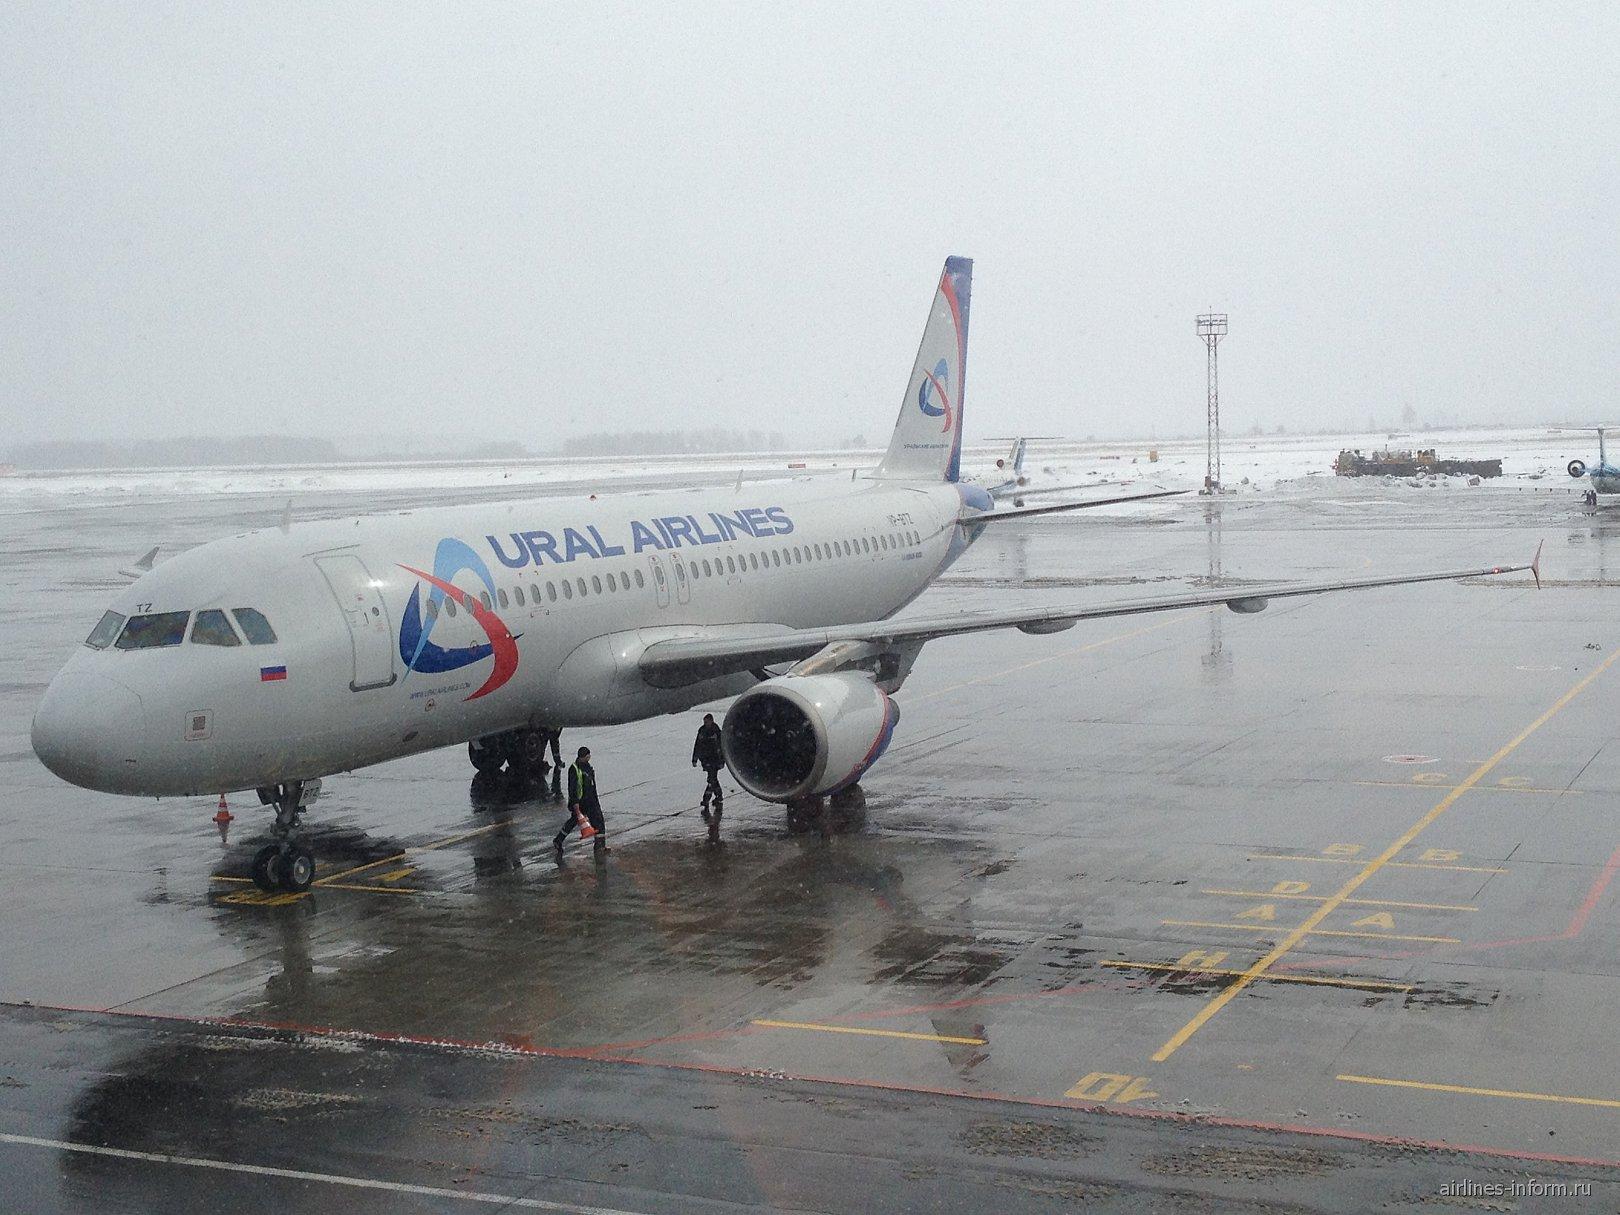 Airbus A320 Уральских авиалиний в аэропорту Кольцово